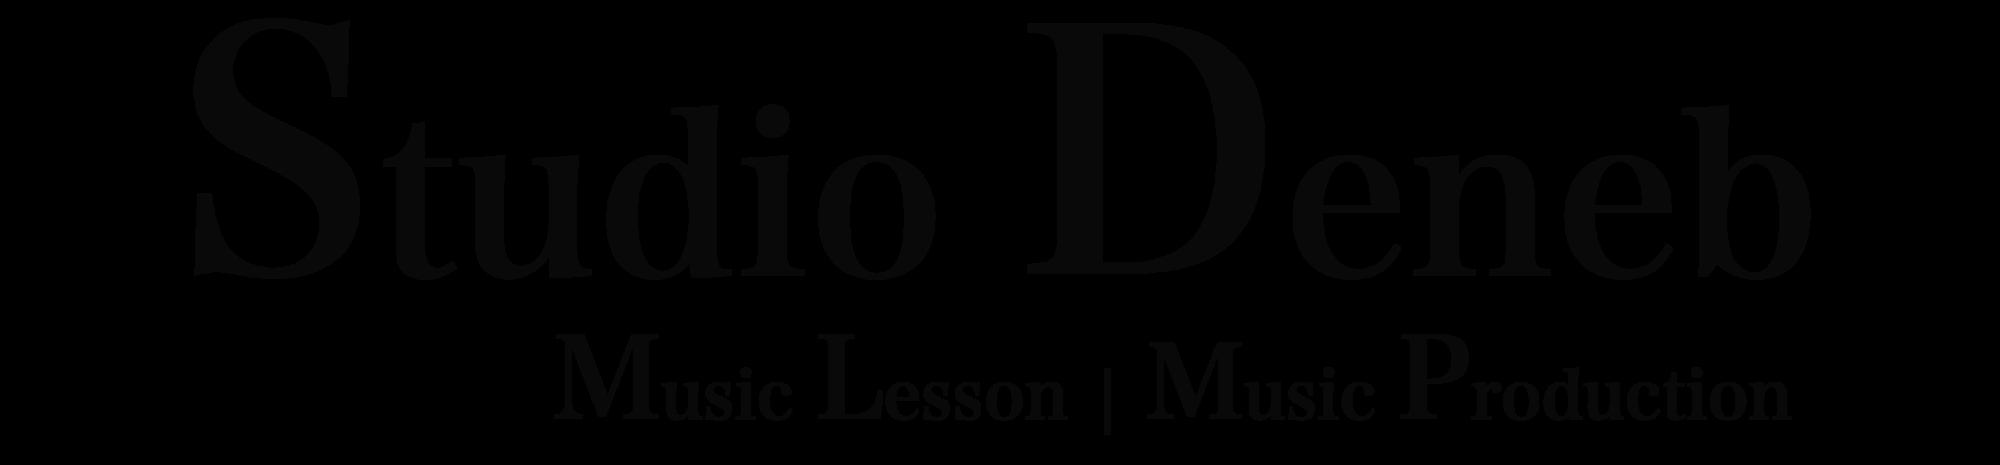 Studio Deneb | Music Production